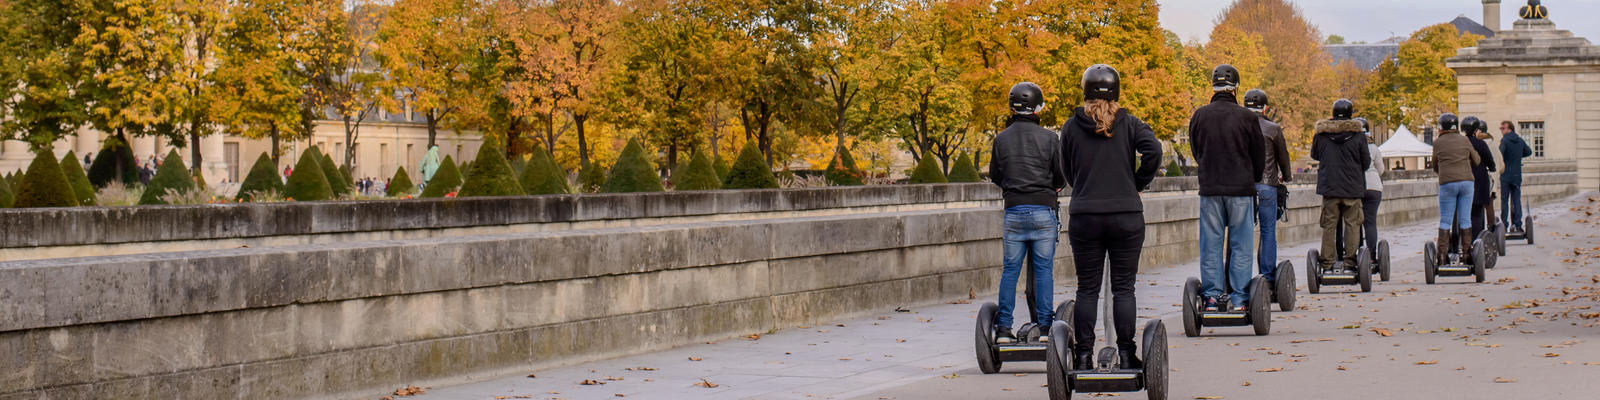 Group segway tour in Paris, France (Photo: Oleg Mikhaylov/Shutterstock)